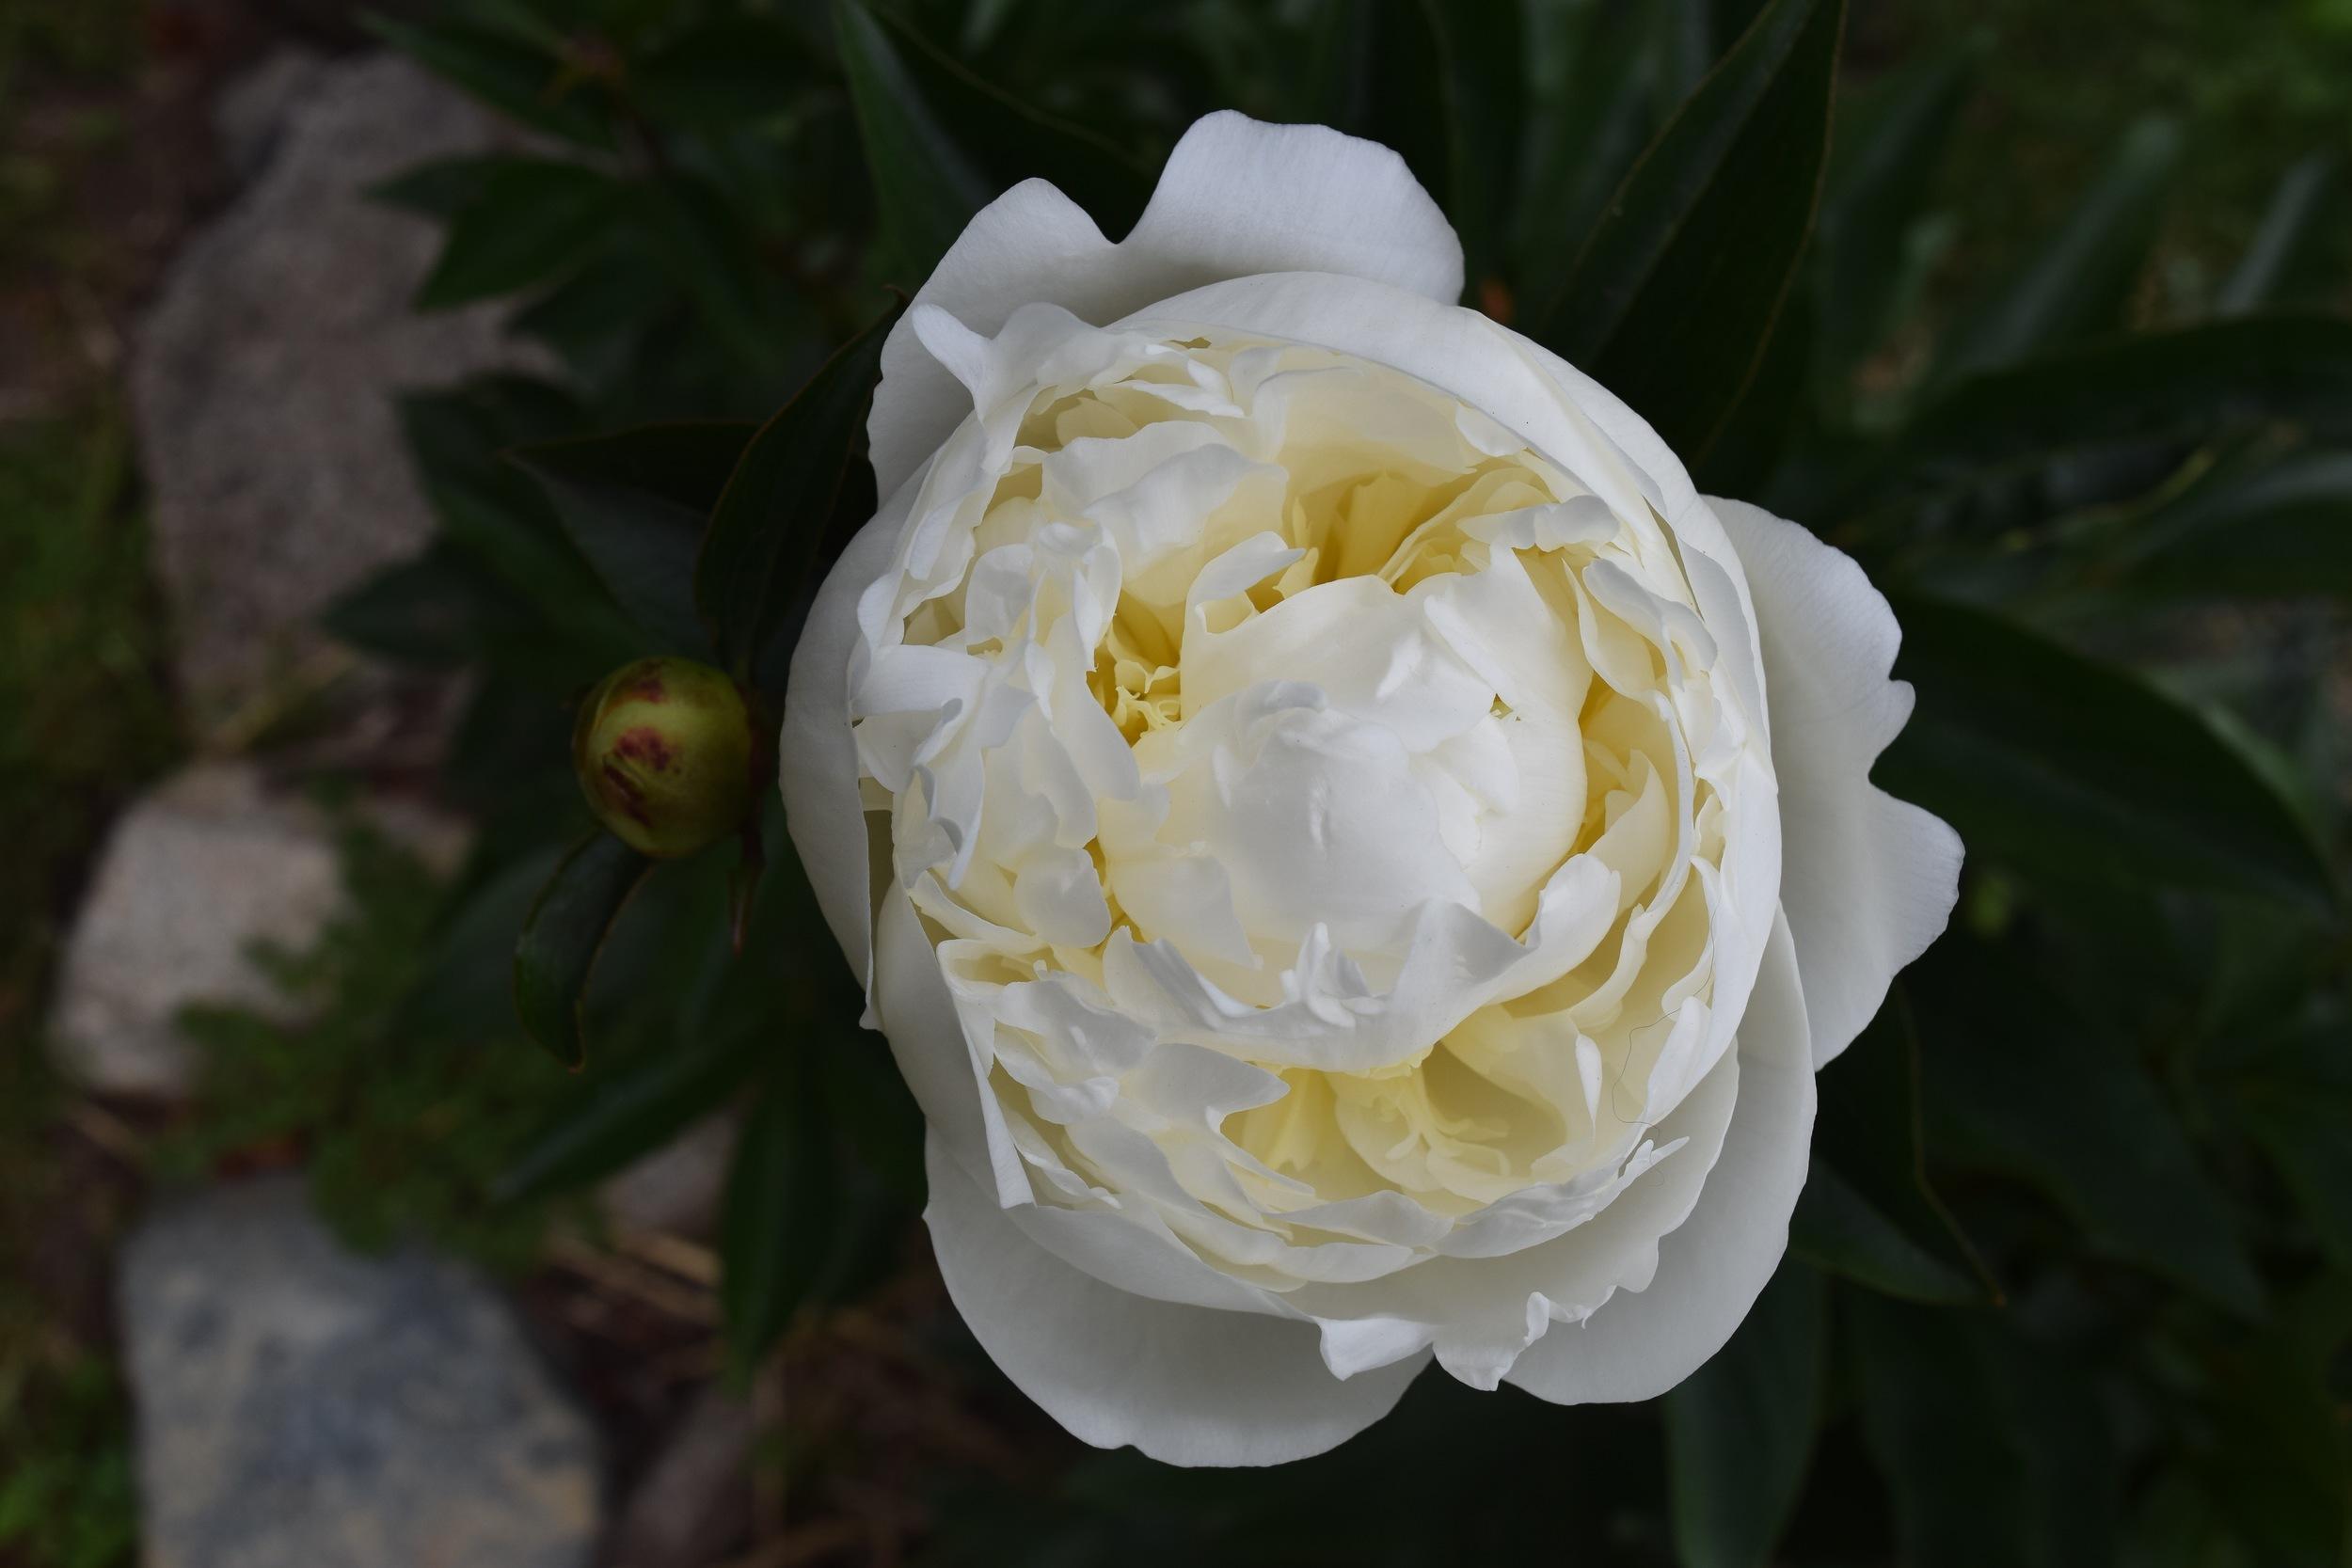 White peony flower  photo: Claire Nollman